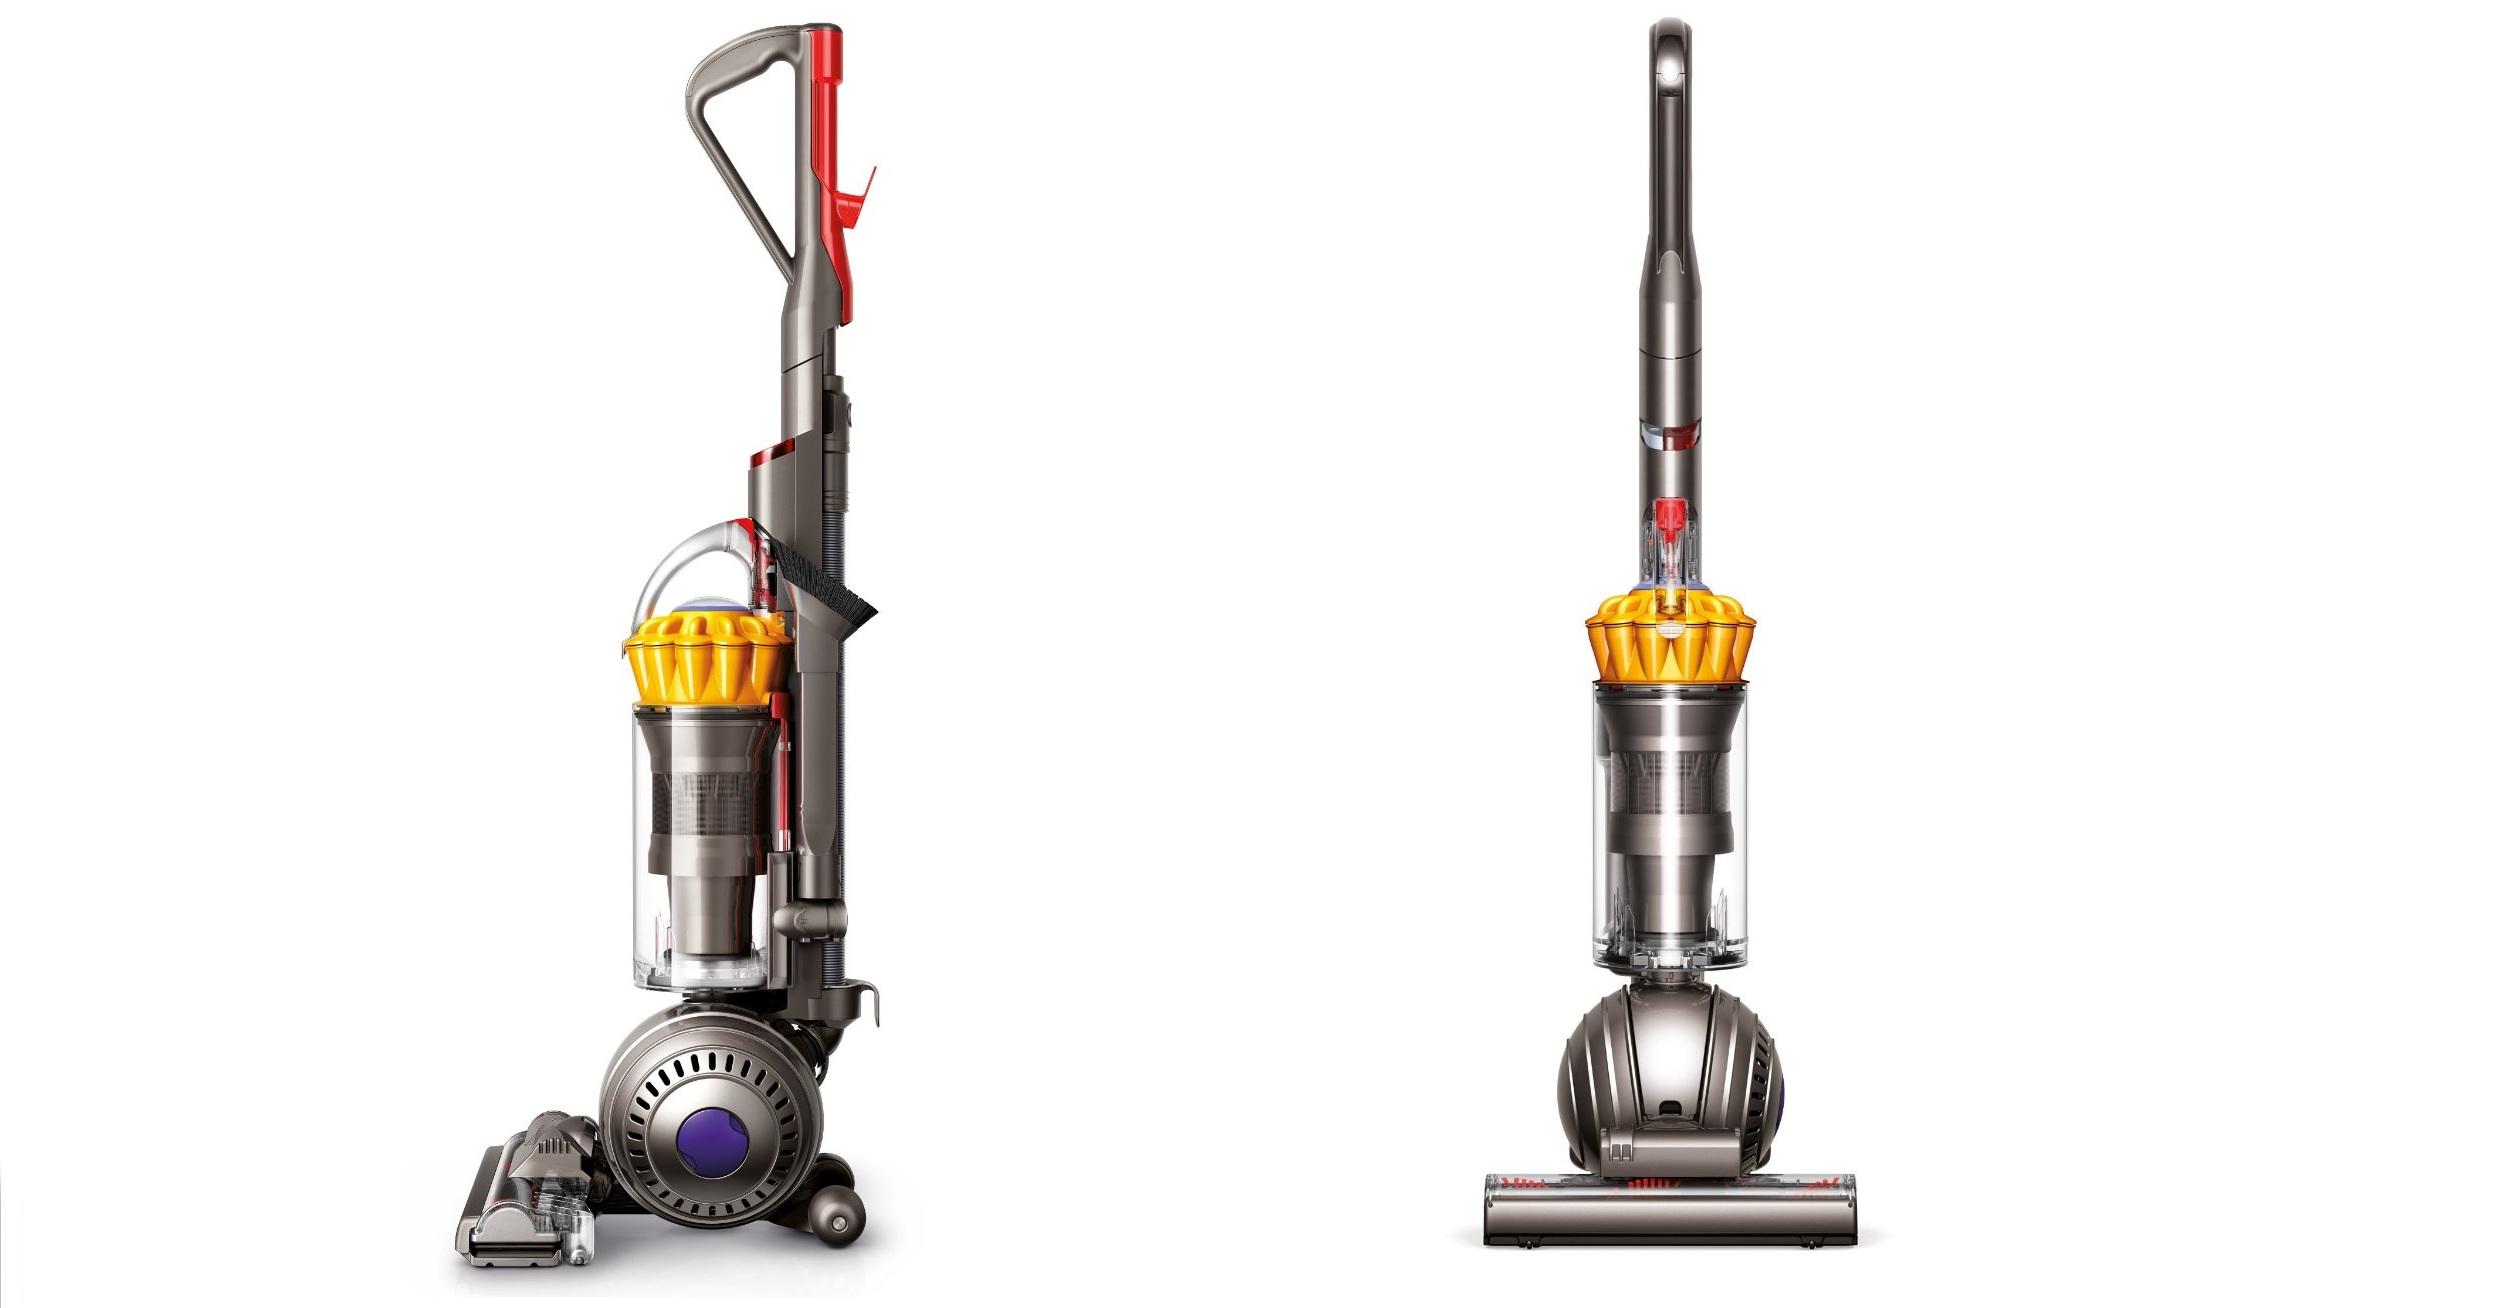 Dyson Dc40 Multi Floor Upright Vacuum Cleaner Bagless